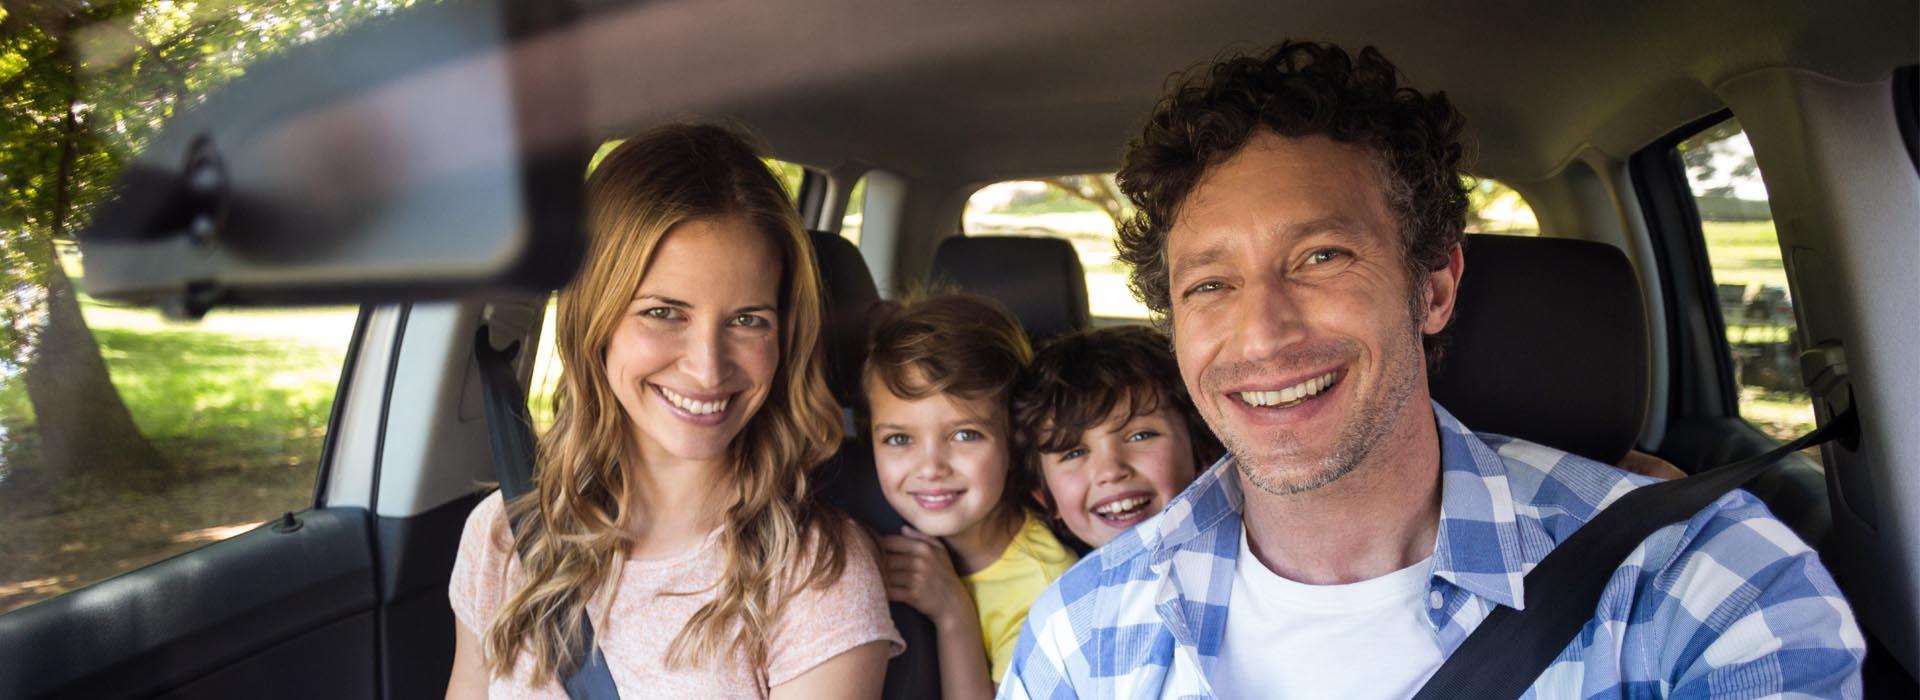 Header - Auto Insurance Rate Lock